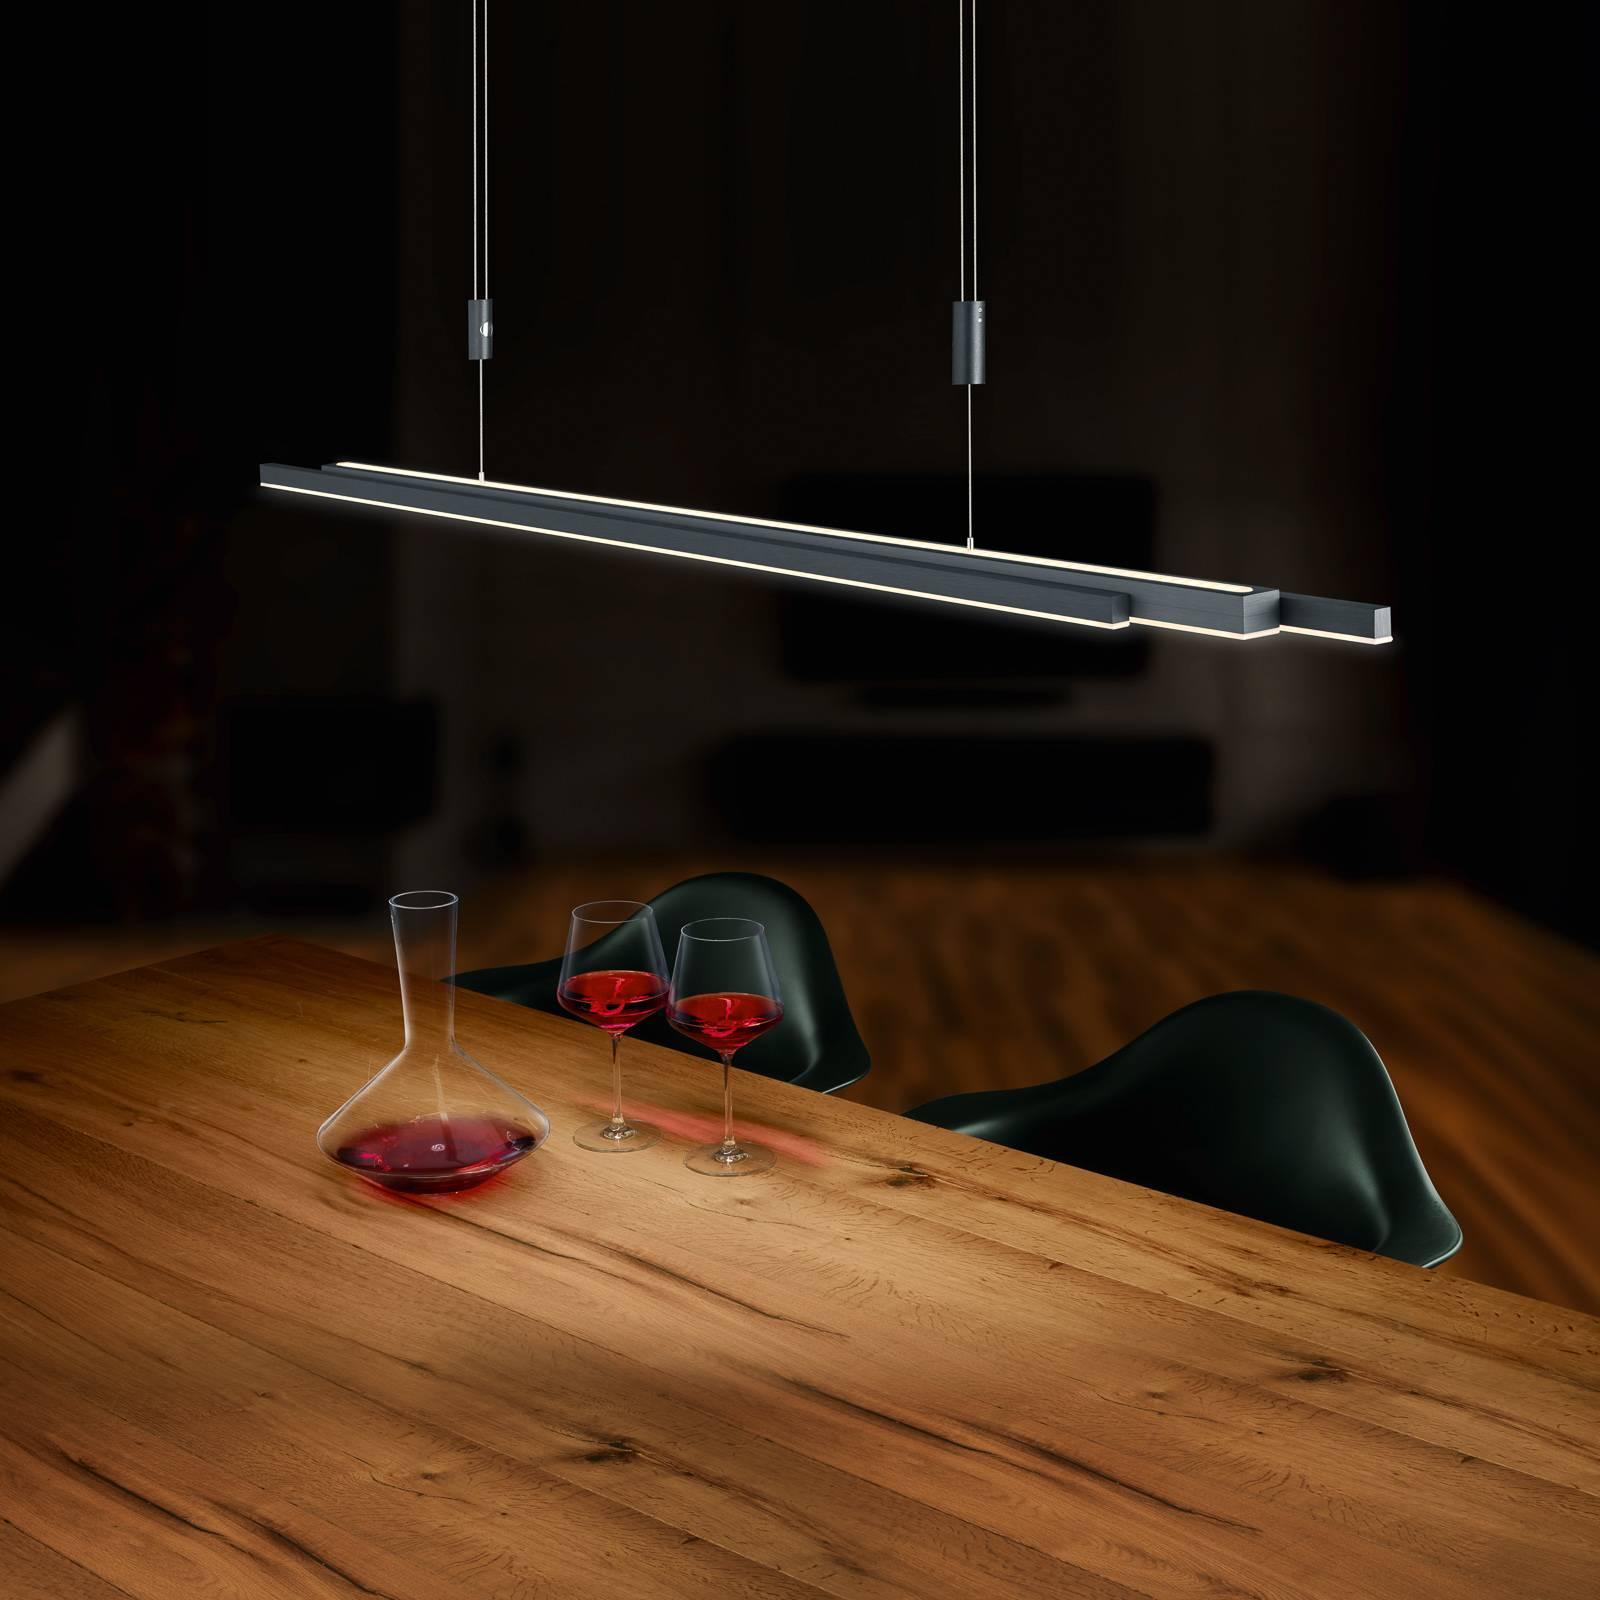 BANKAMP L-lightLINE LED ZigBee up/down antrasiitti